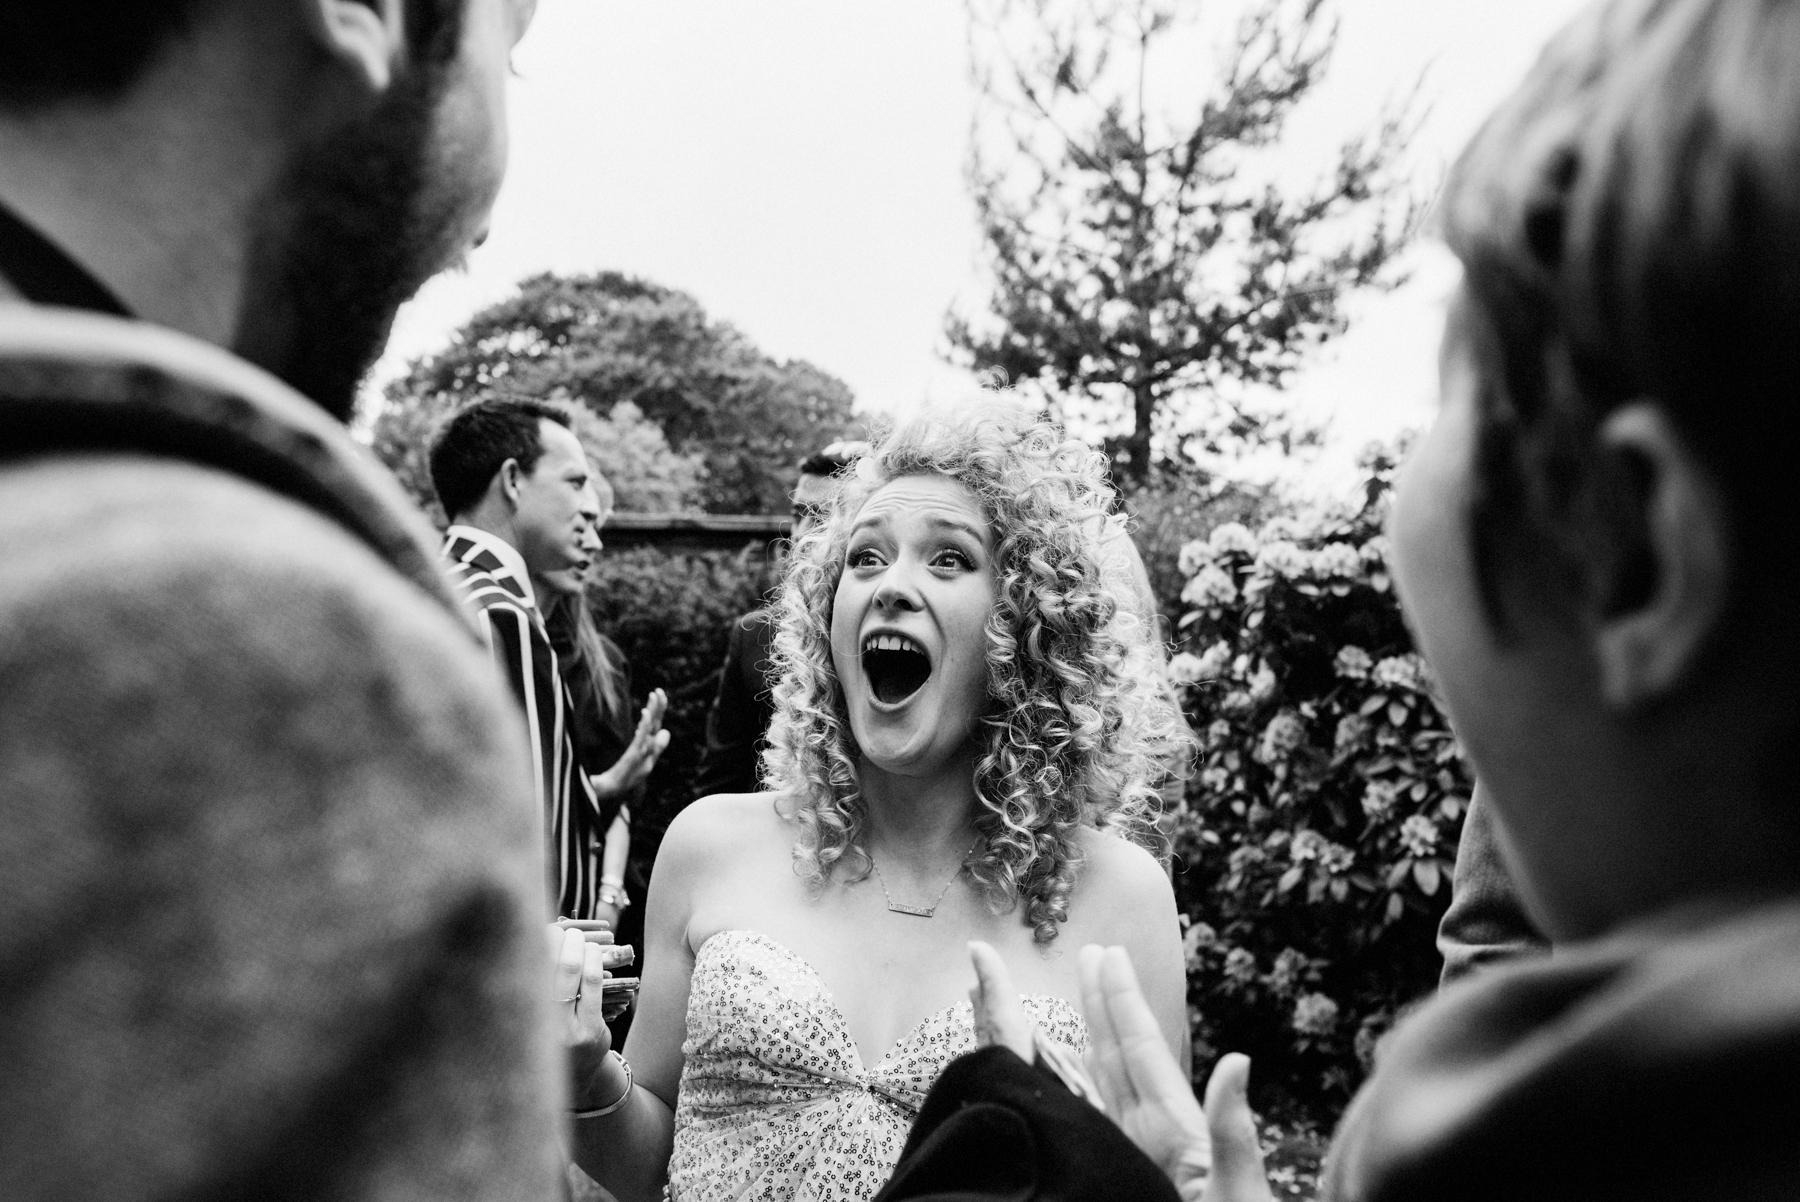 Reportage wedding photography Bath